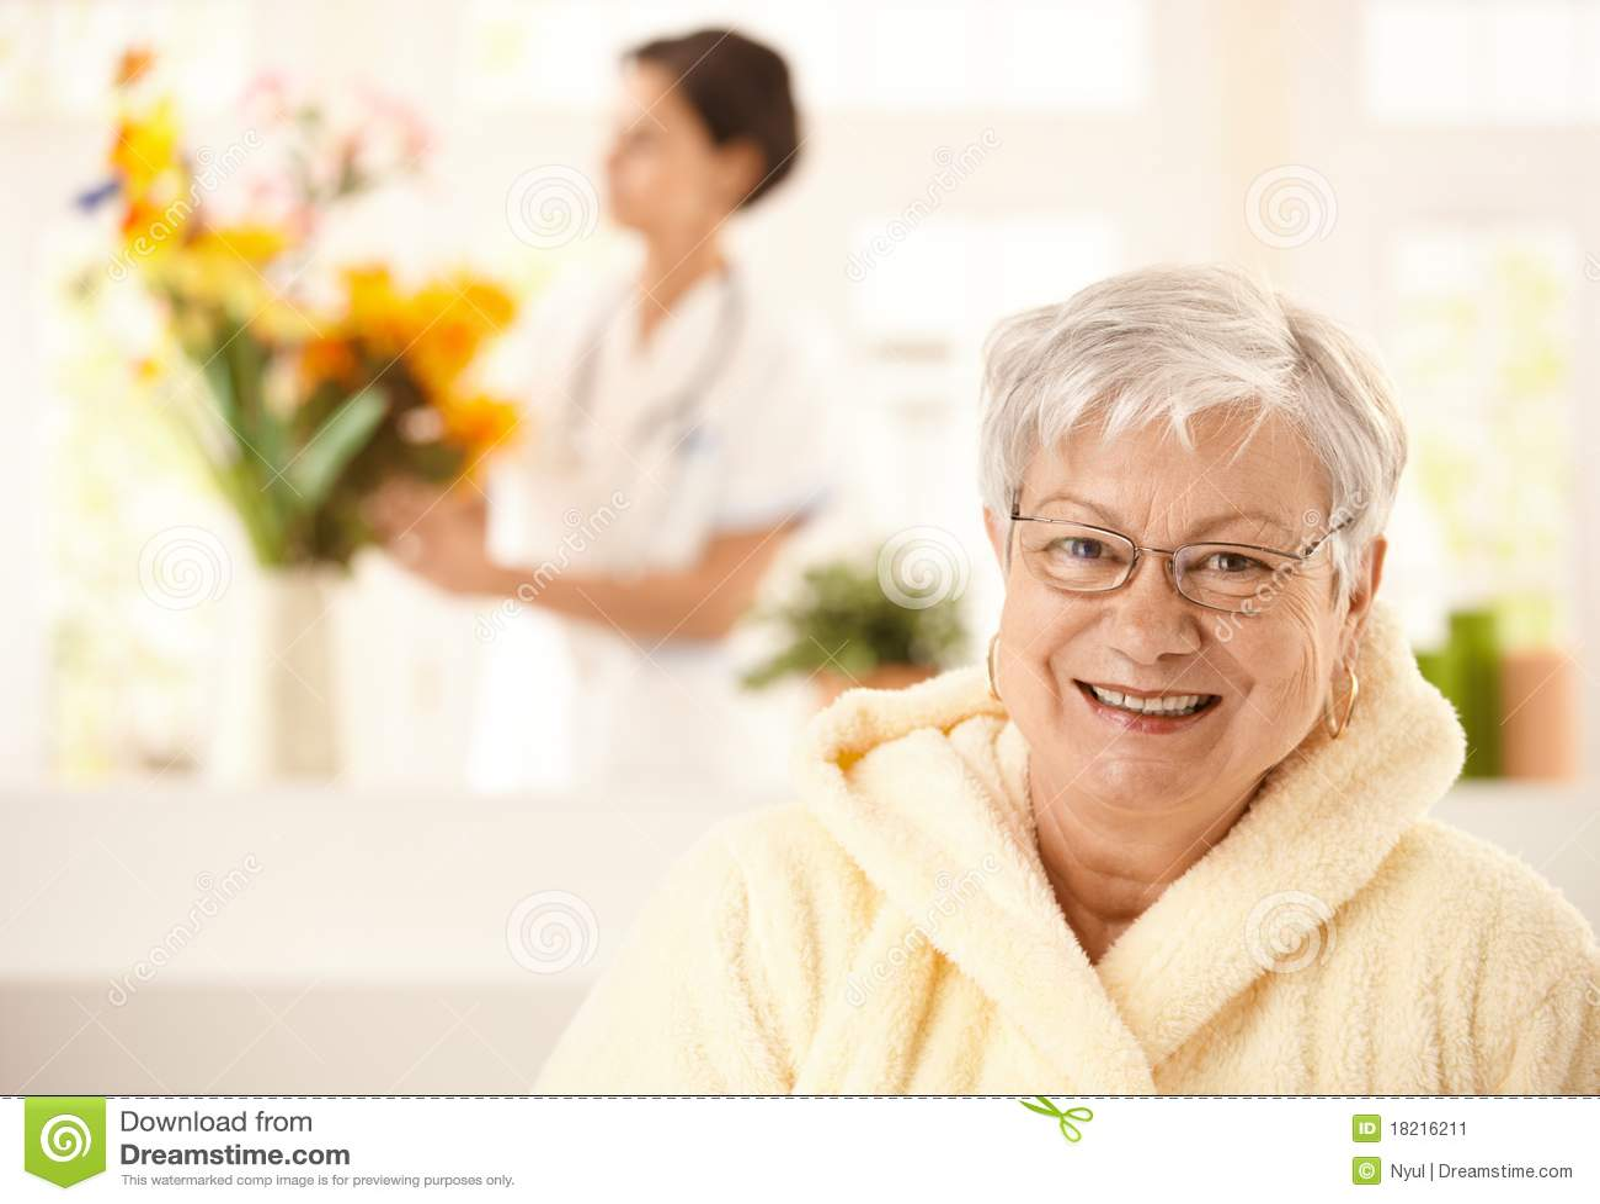 Portrait of happy elderly woman